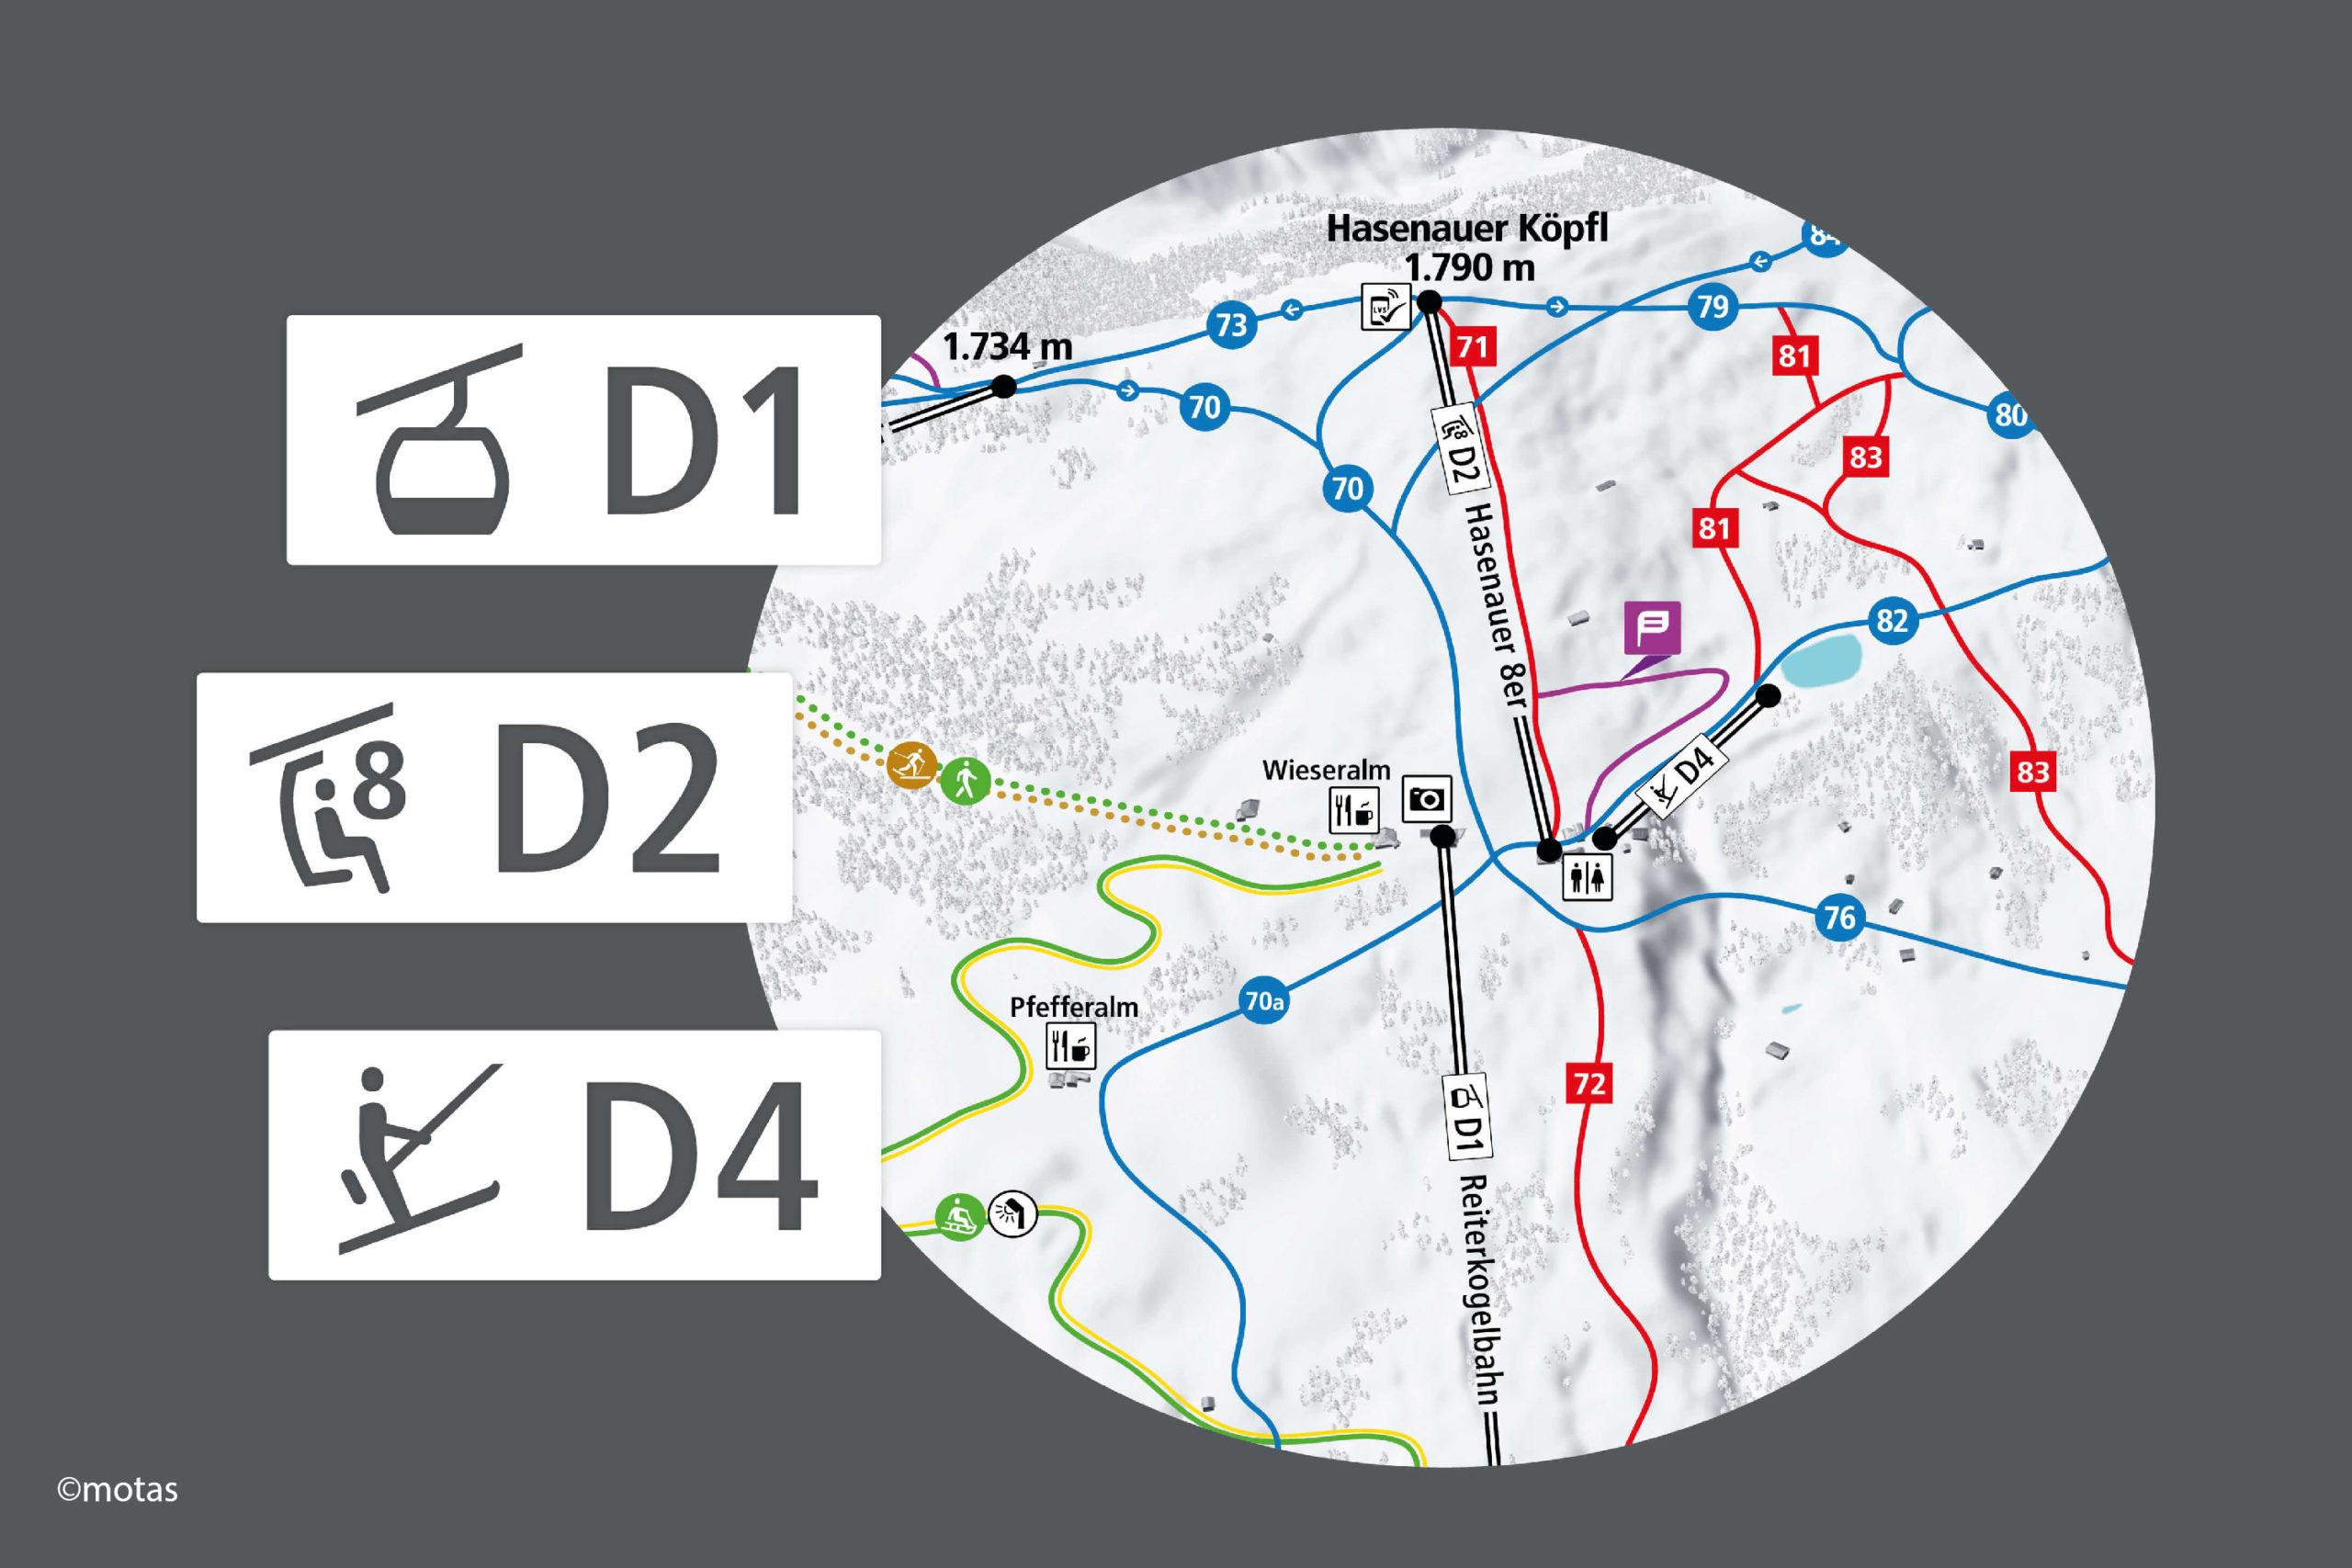 Pistenleitsystem Skicircus Saalbach Hinterglemm Leogang Fieberbrunn Zone D Reiterkogel